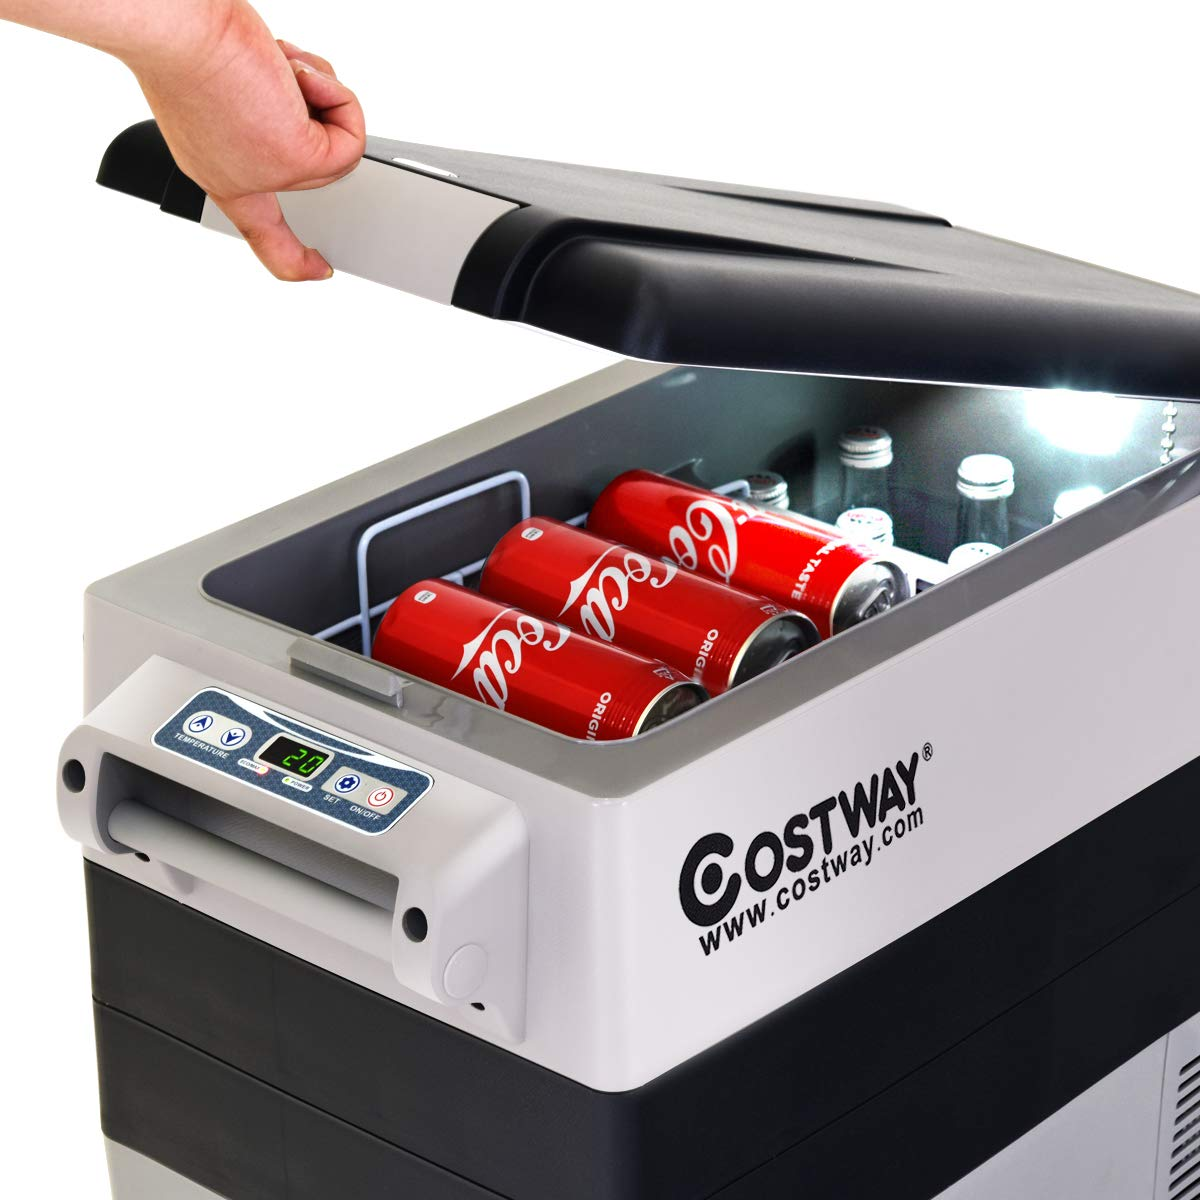 COSTWAY Compact Car Travel Refrigerator Freezer Portable Compressor Mini Fridge For Car and Home Travel Truck Party 54 Quart Camping Picnic Outdoor